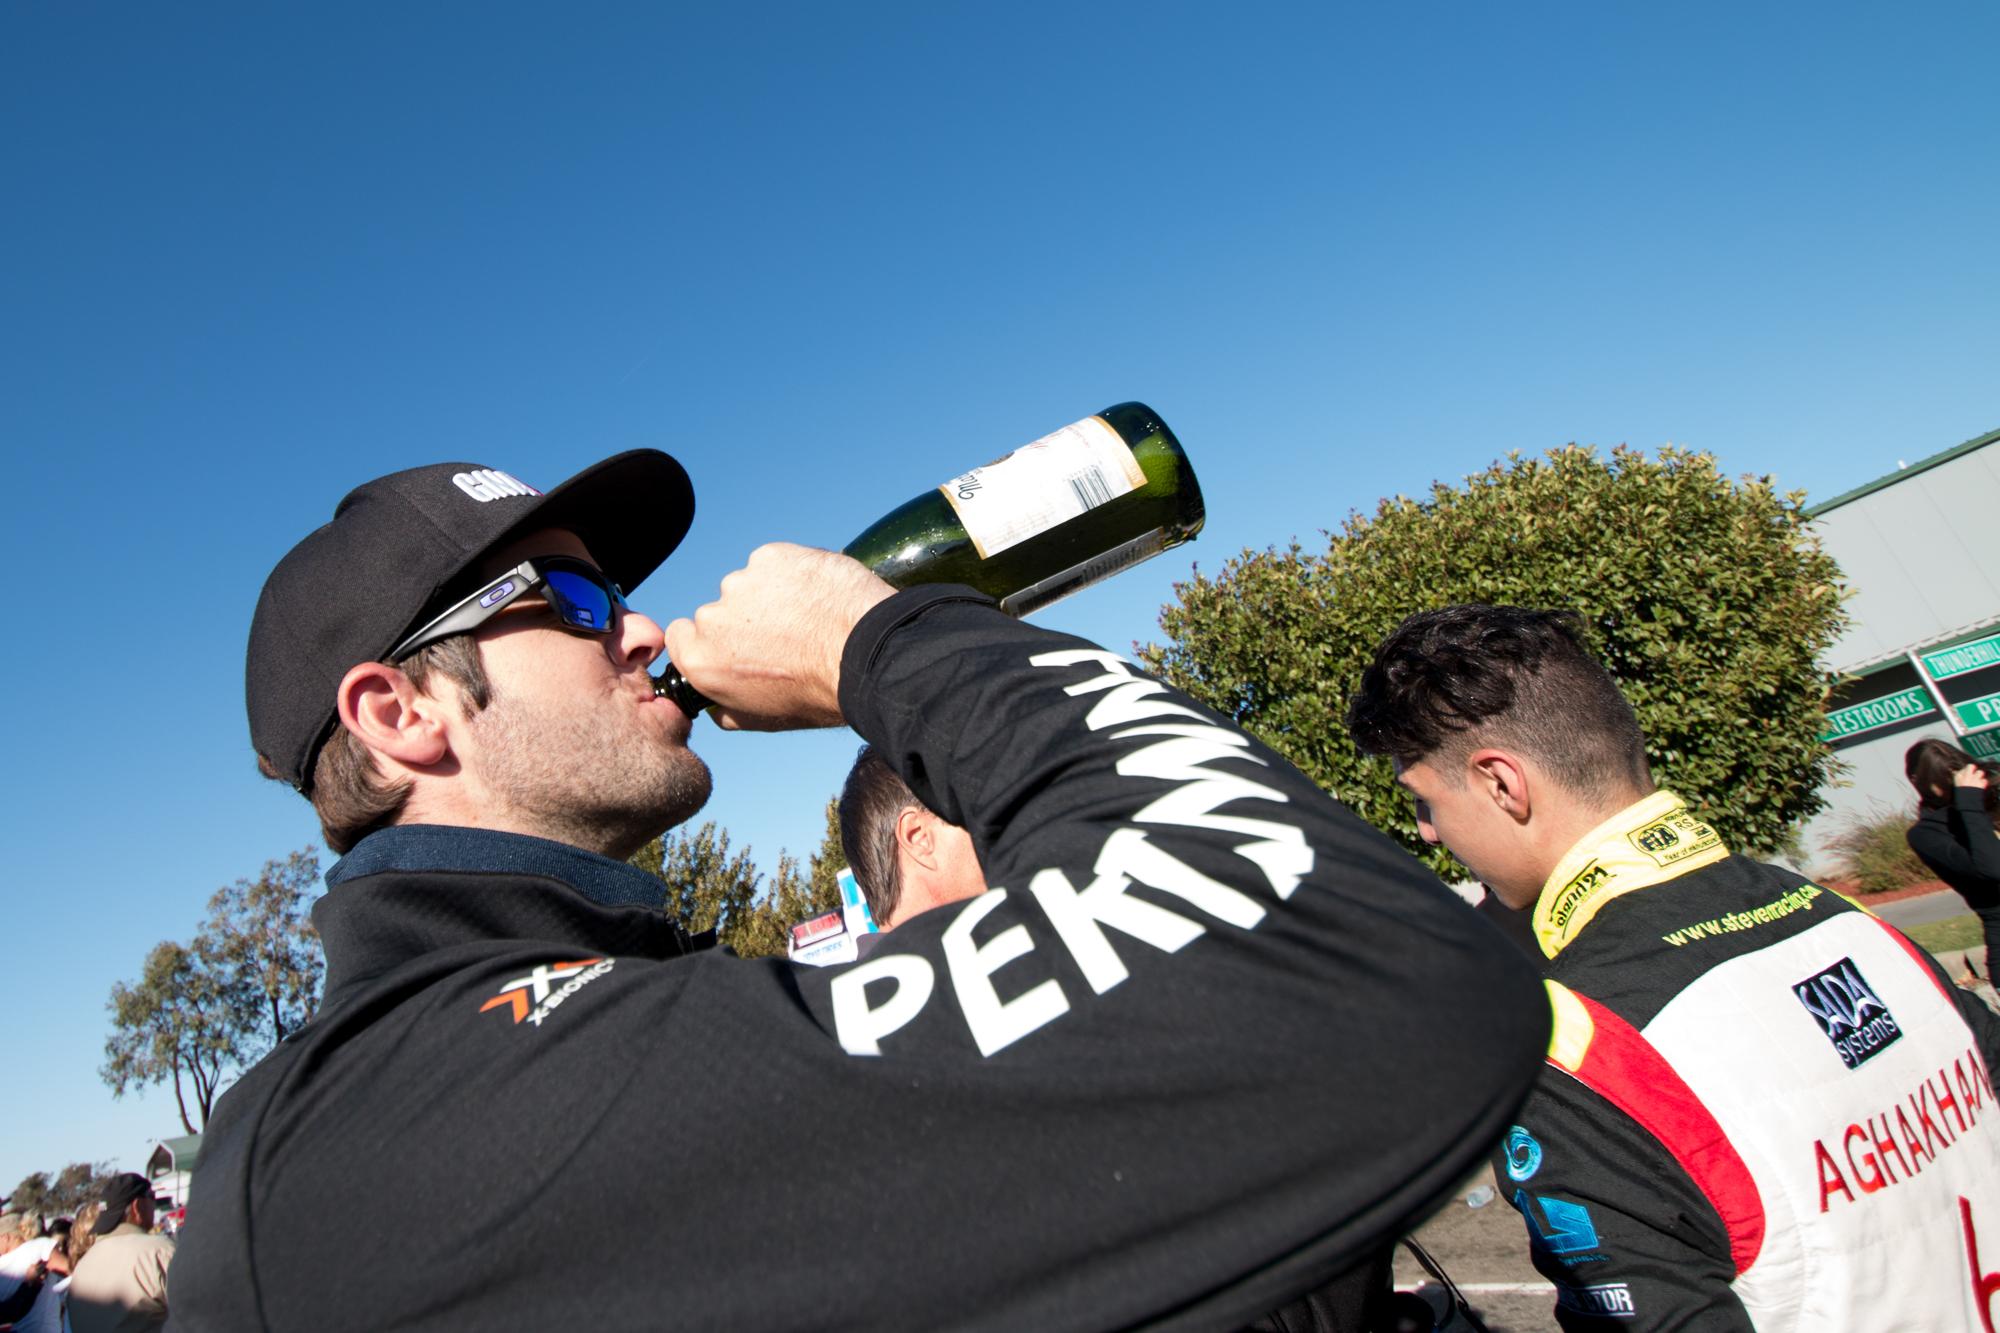 Steven-Racing-20130208-45962.jpg